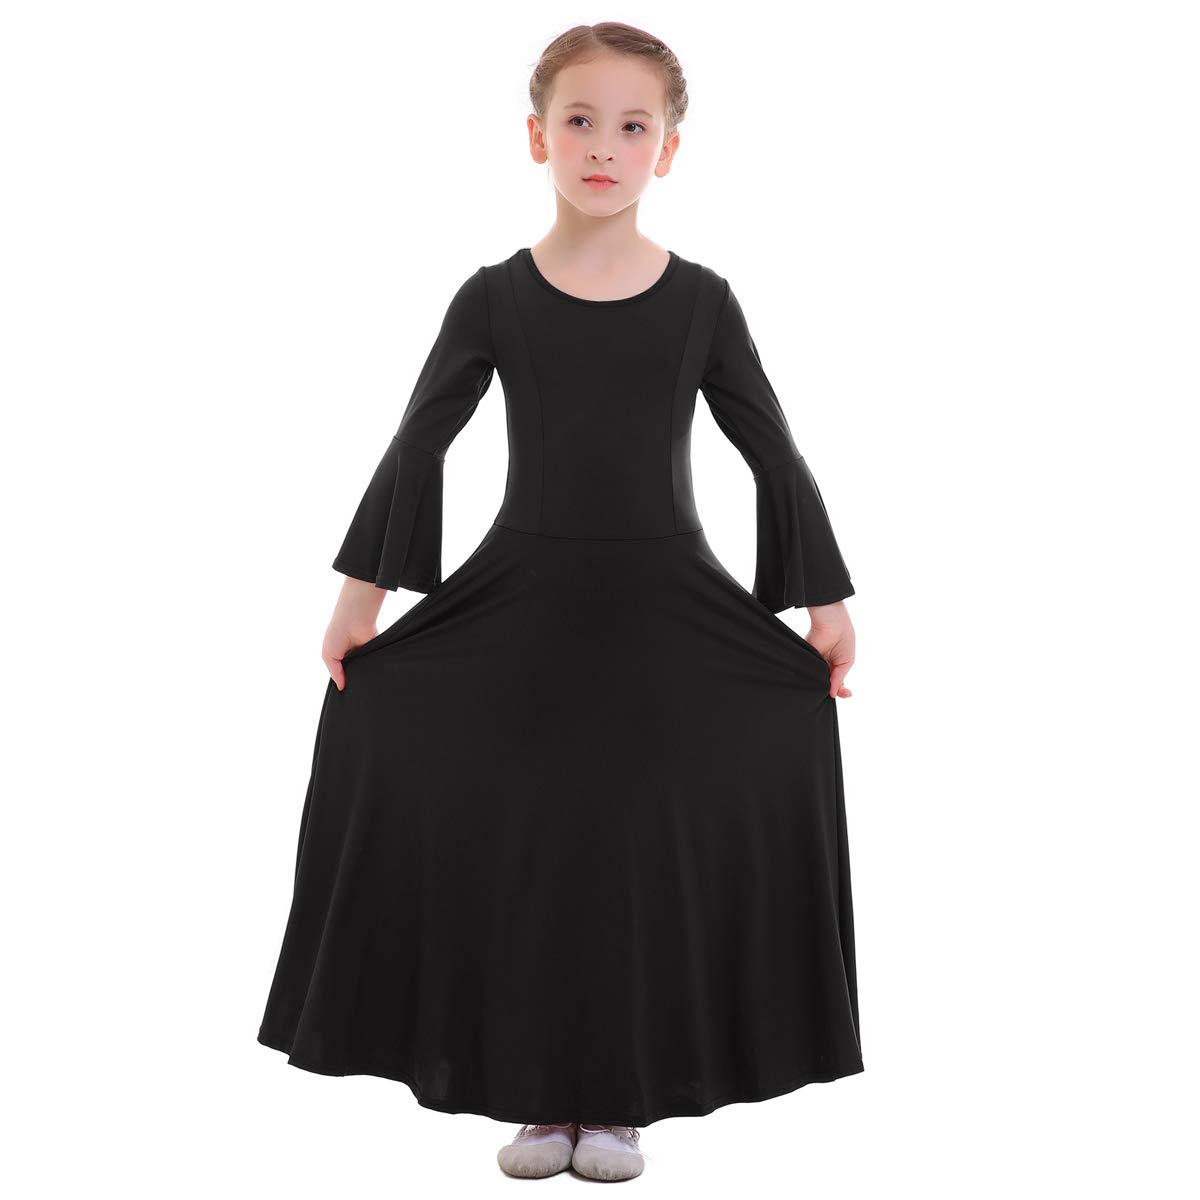 abaf7038d Amazon.com: Girls Praise Liturgical Lyrical Dress Bell Long Sleeve Dance  Dress Loose Fit Full Length Worship Ballet Costume Dancewear: Clothing